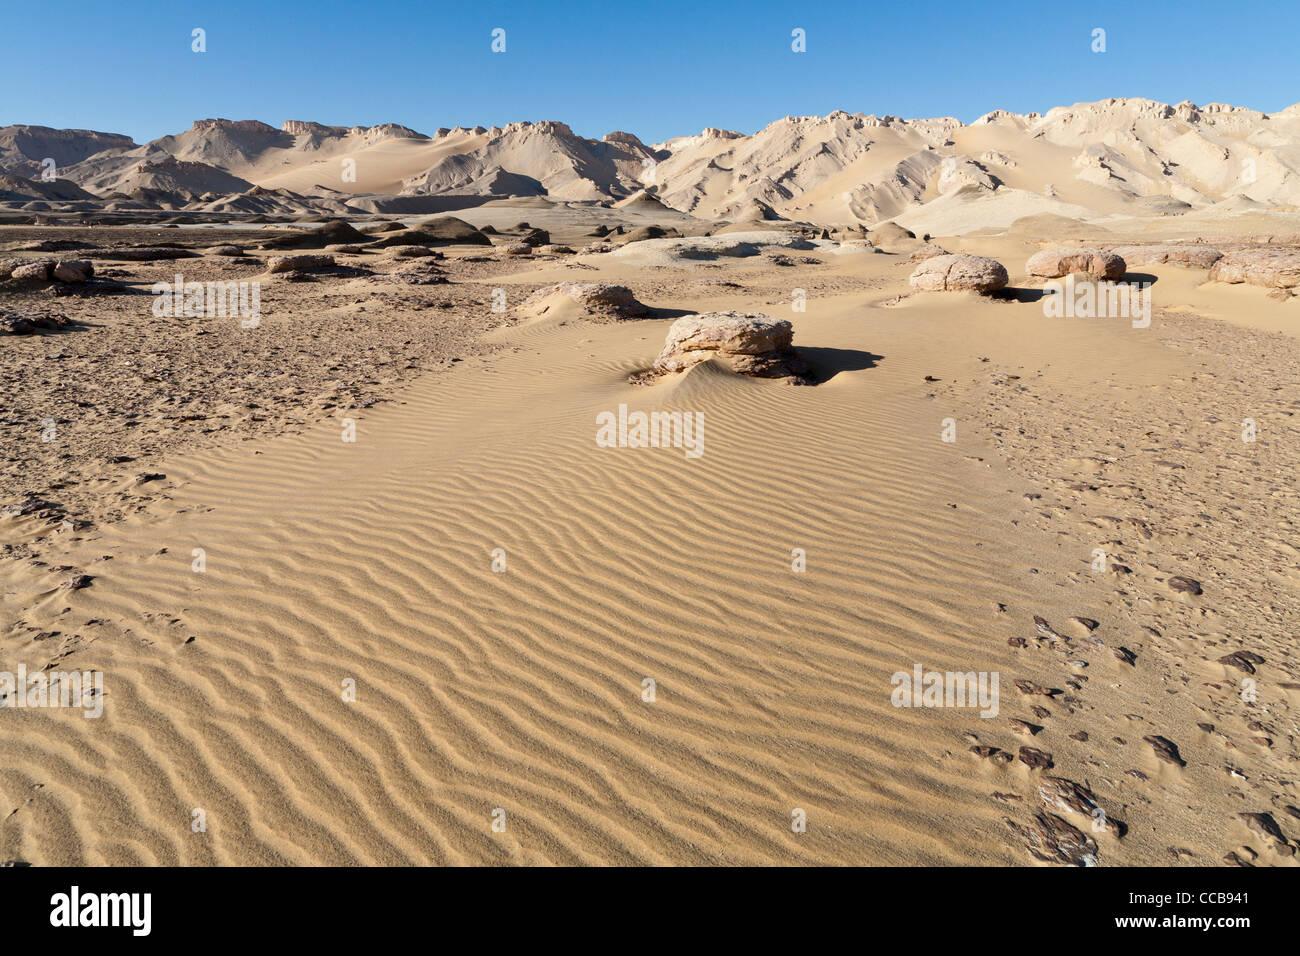 White limestone intrusion on edge of yardang field Dakhla Oasis Egypt  Africa - Stock Image